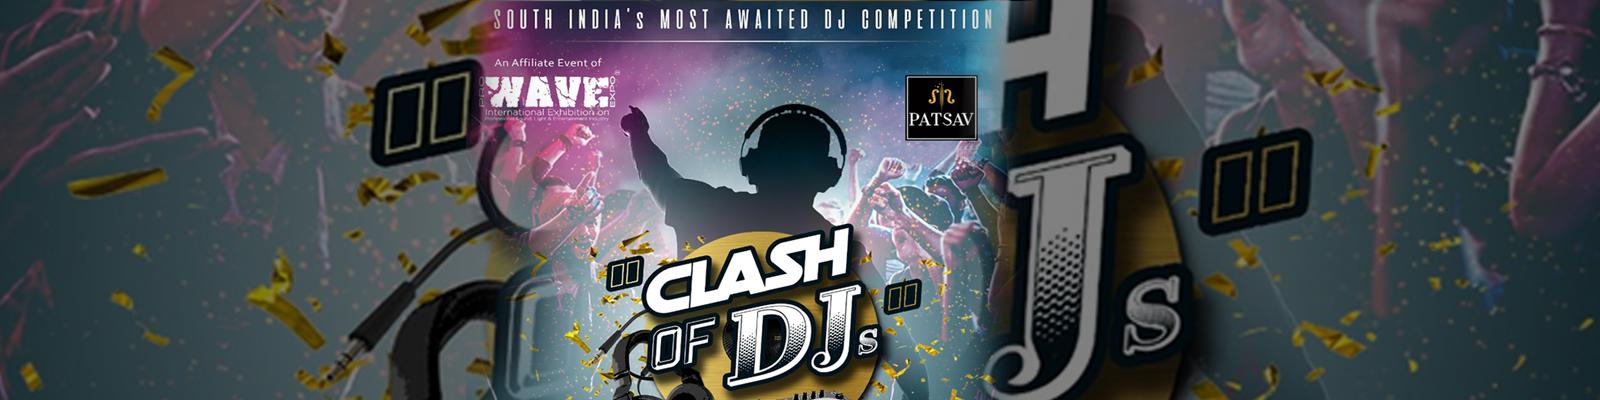 CLASH OF DJs